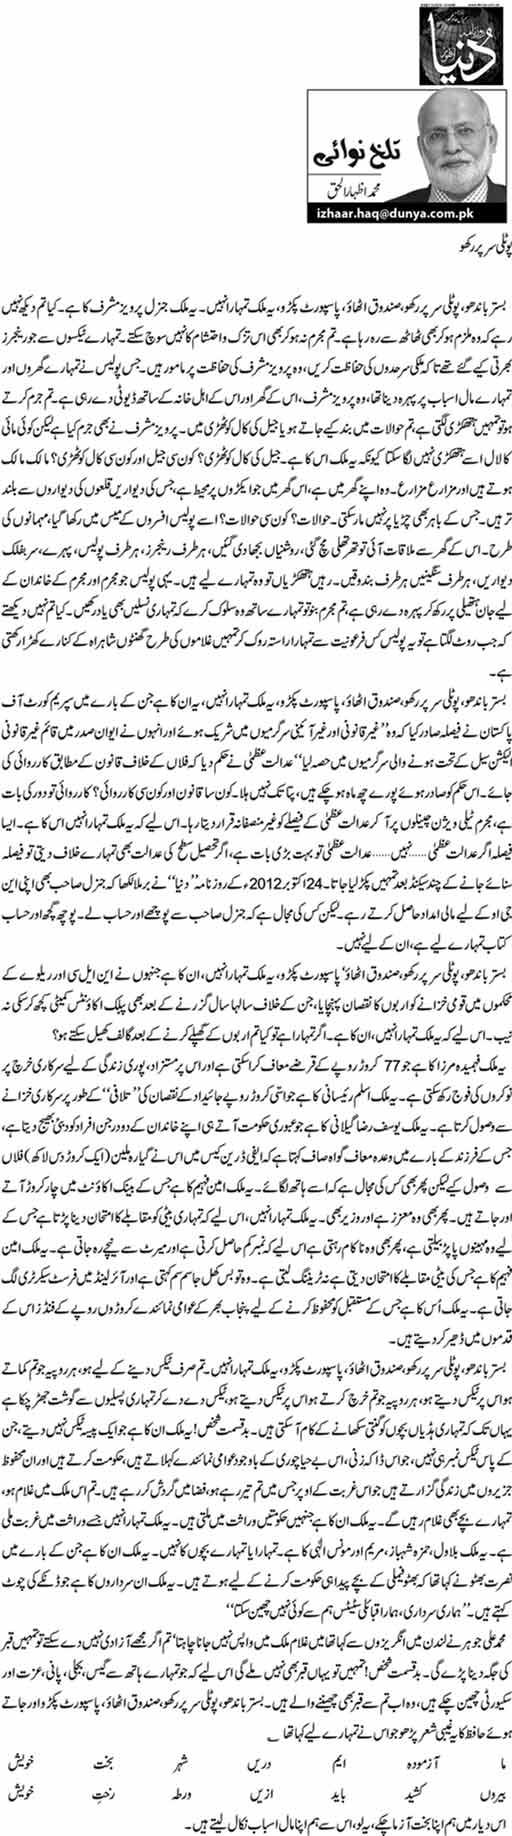 Potli Sir Par Rakho - M. Izhar ul Haq